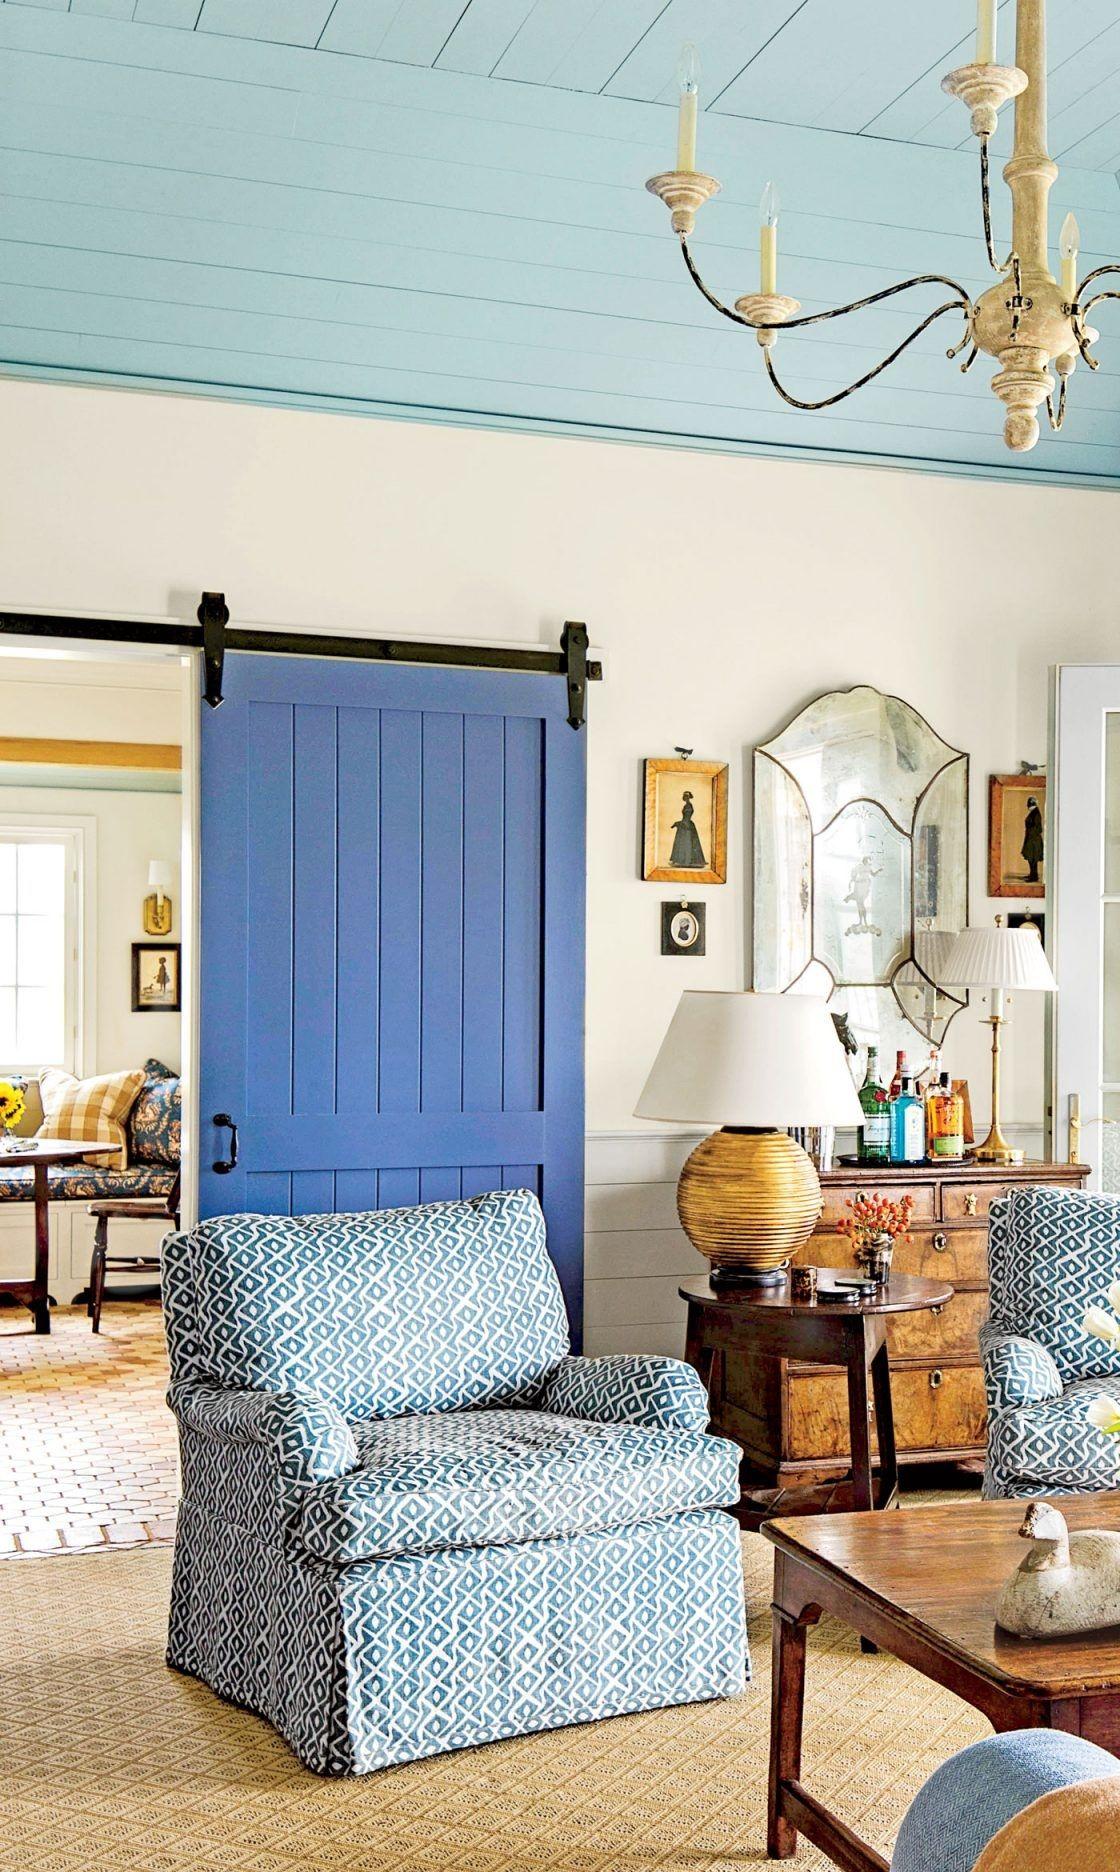 70 Home Decor Ideas Diy Cheap Easy Simple Elegant Southern living room decor